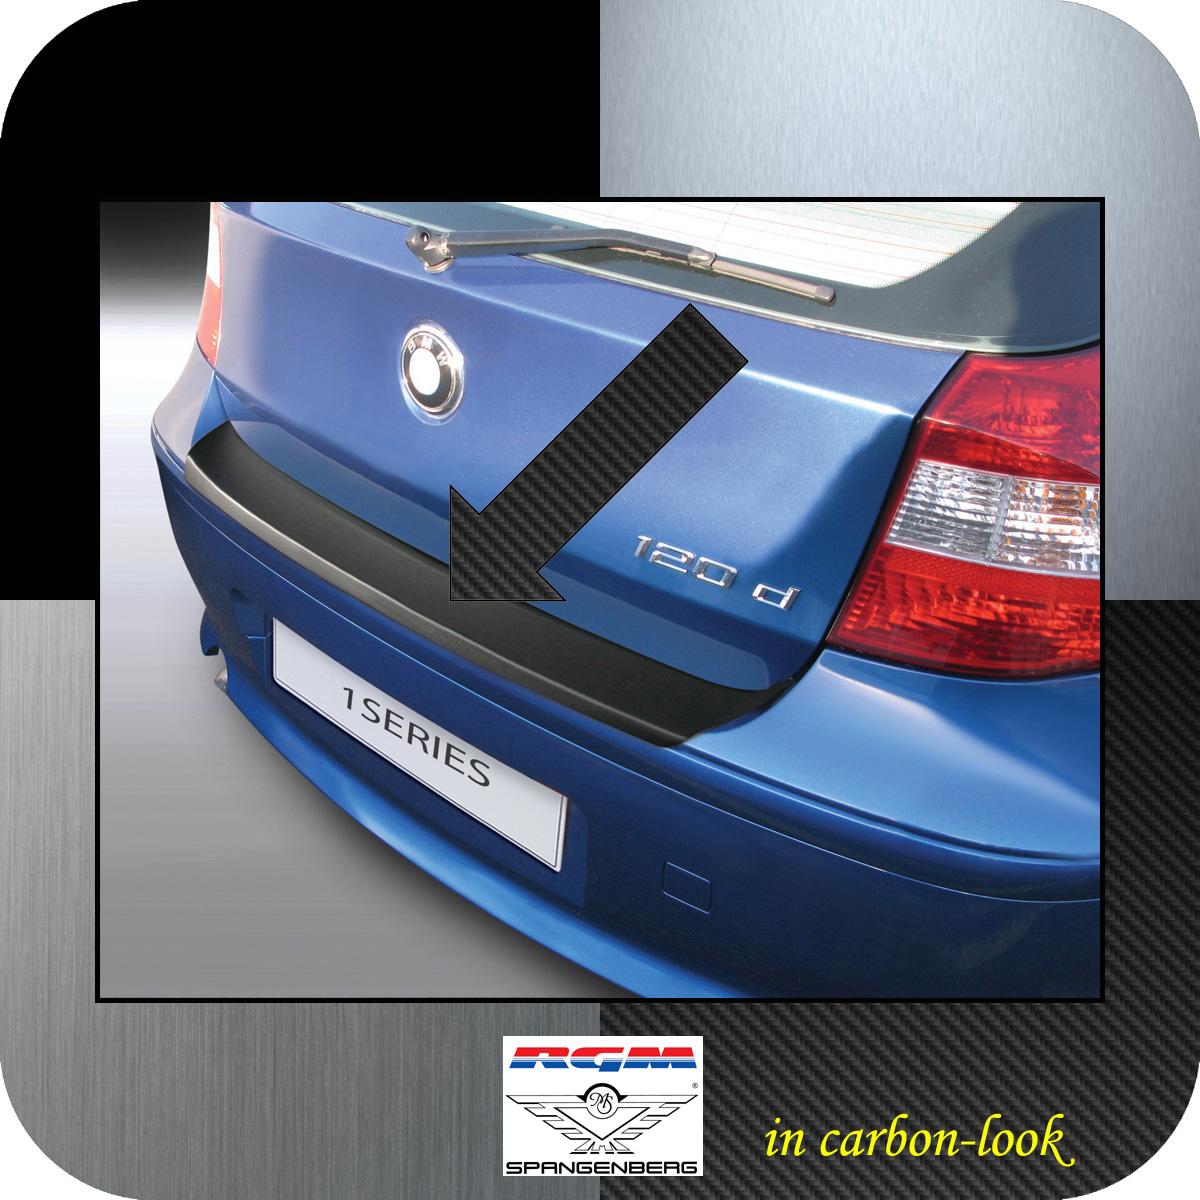 Ladekantenschutz Carbon-Look BMW 1er E81 E87 Schrägheck vor Mopf 2003-07 3509441